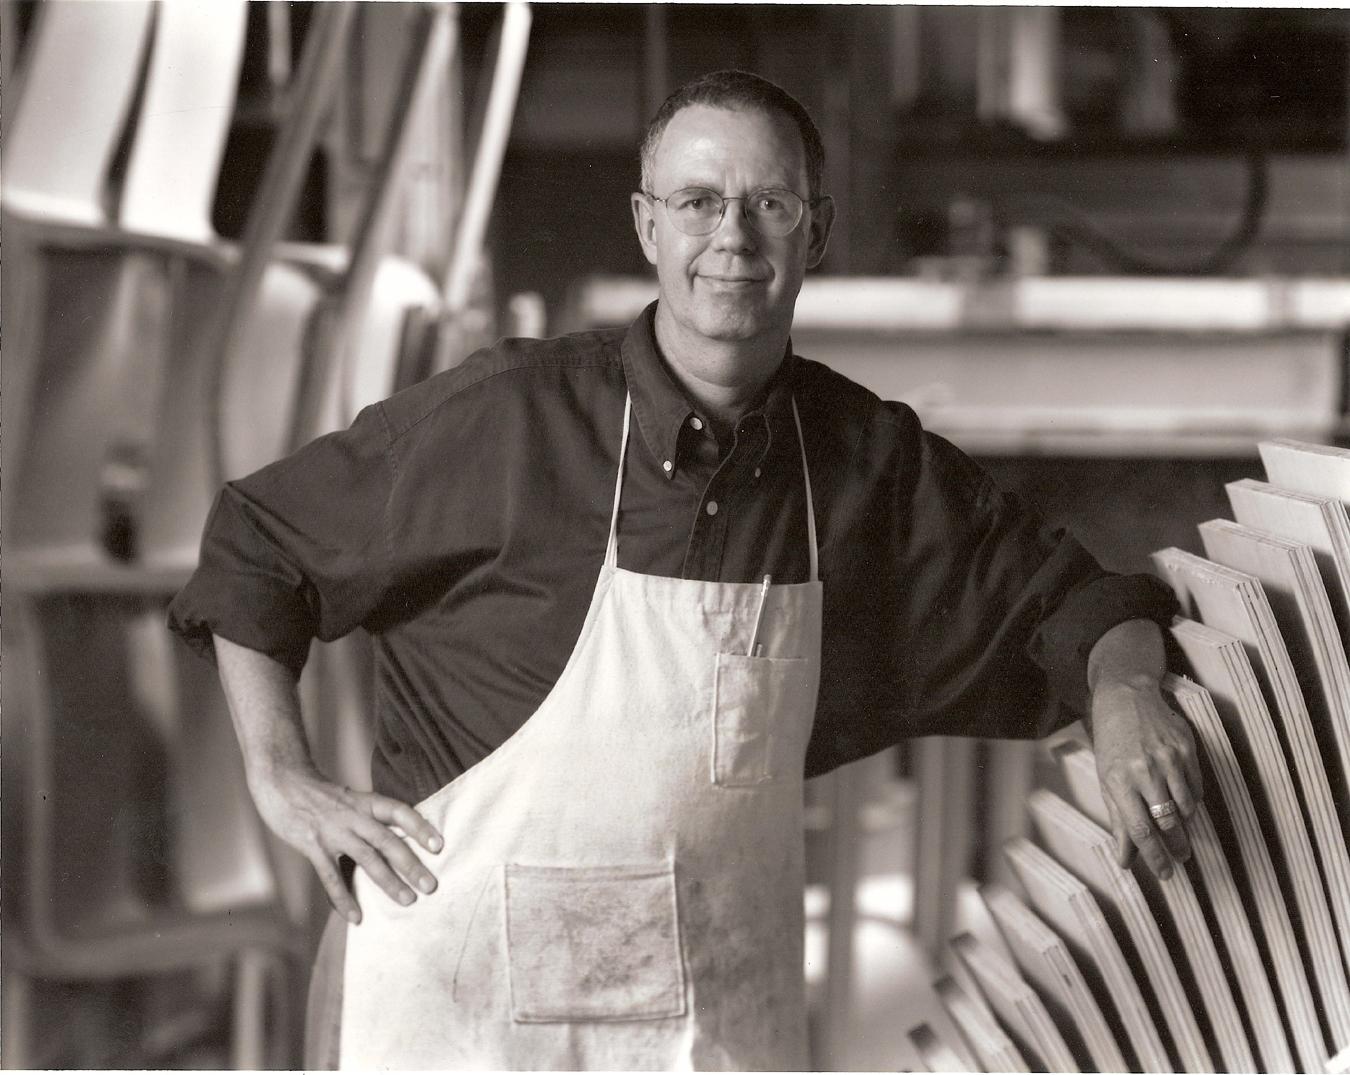 Peter Danko Invention and Craftsmanship